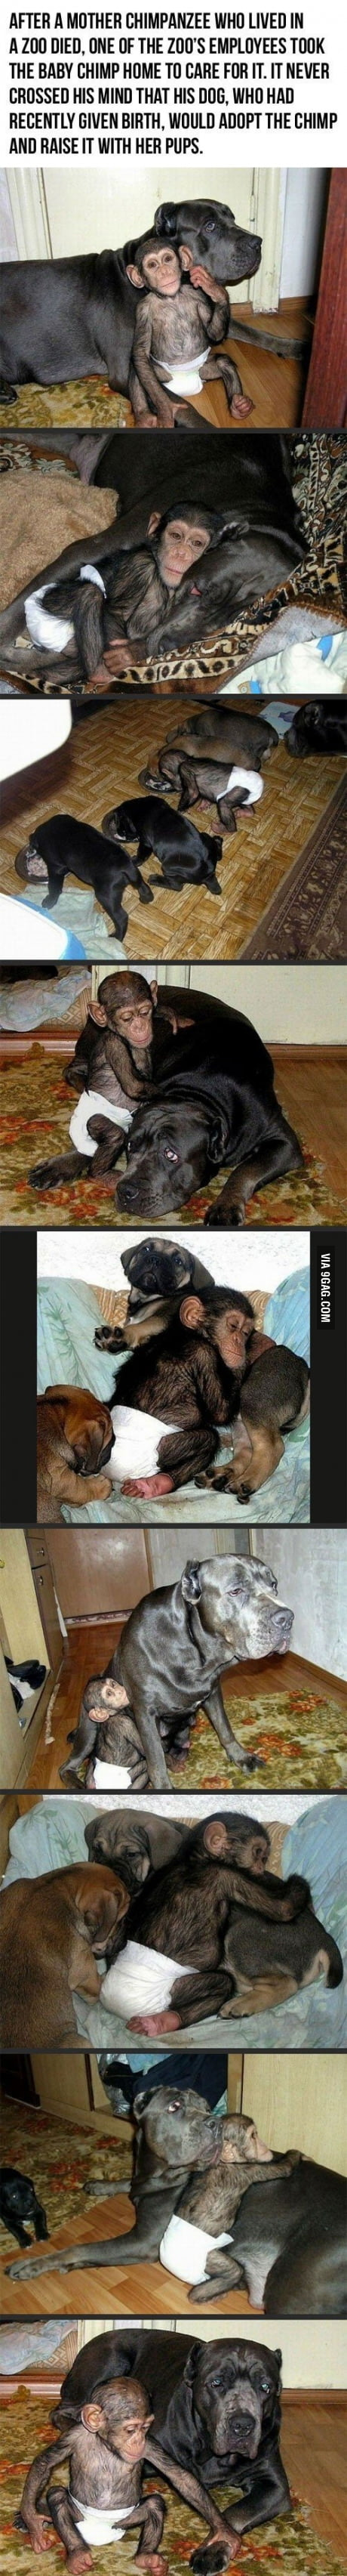 Parenting level: Dog